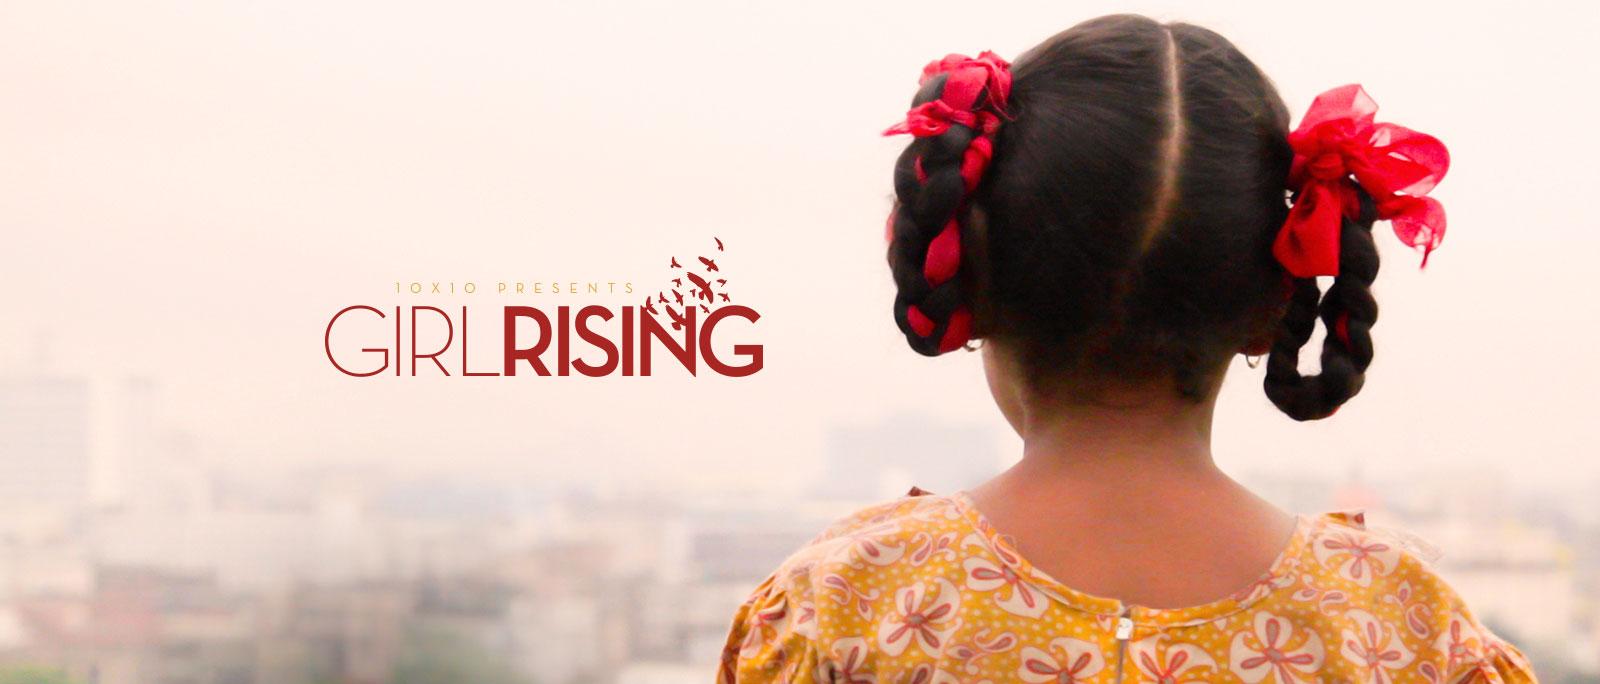 girl-rising-movie-poster-2